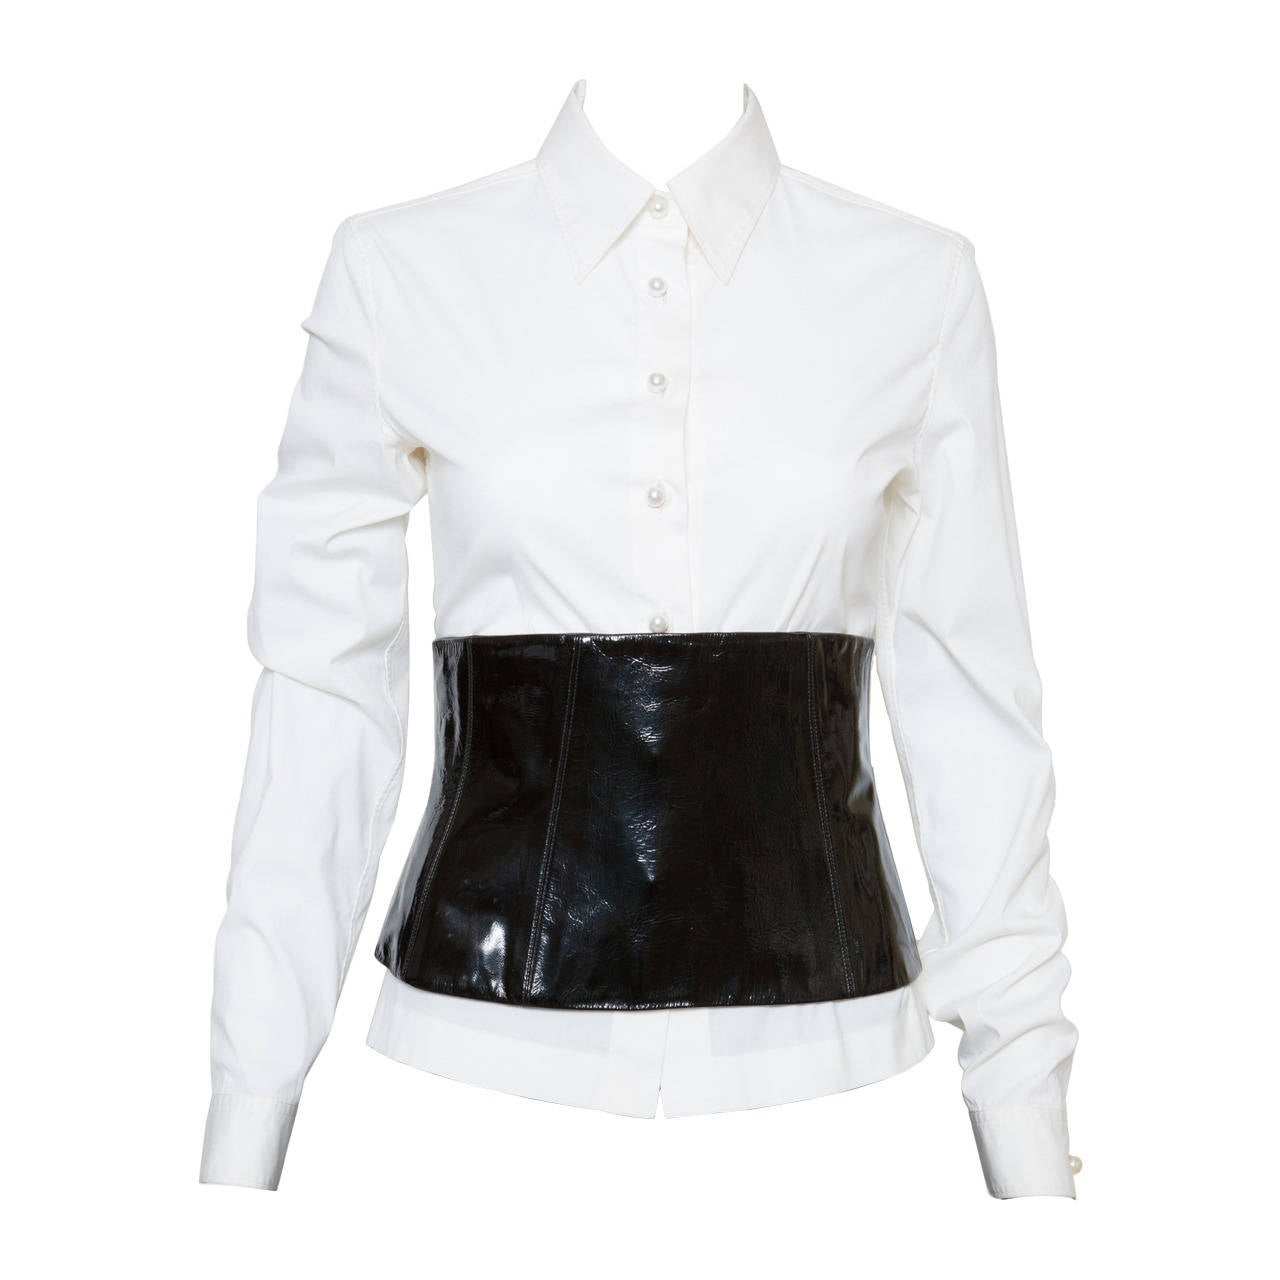 Chanel White Shirt With Black Vinyl Leather Corset Belt 1